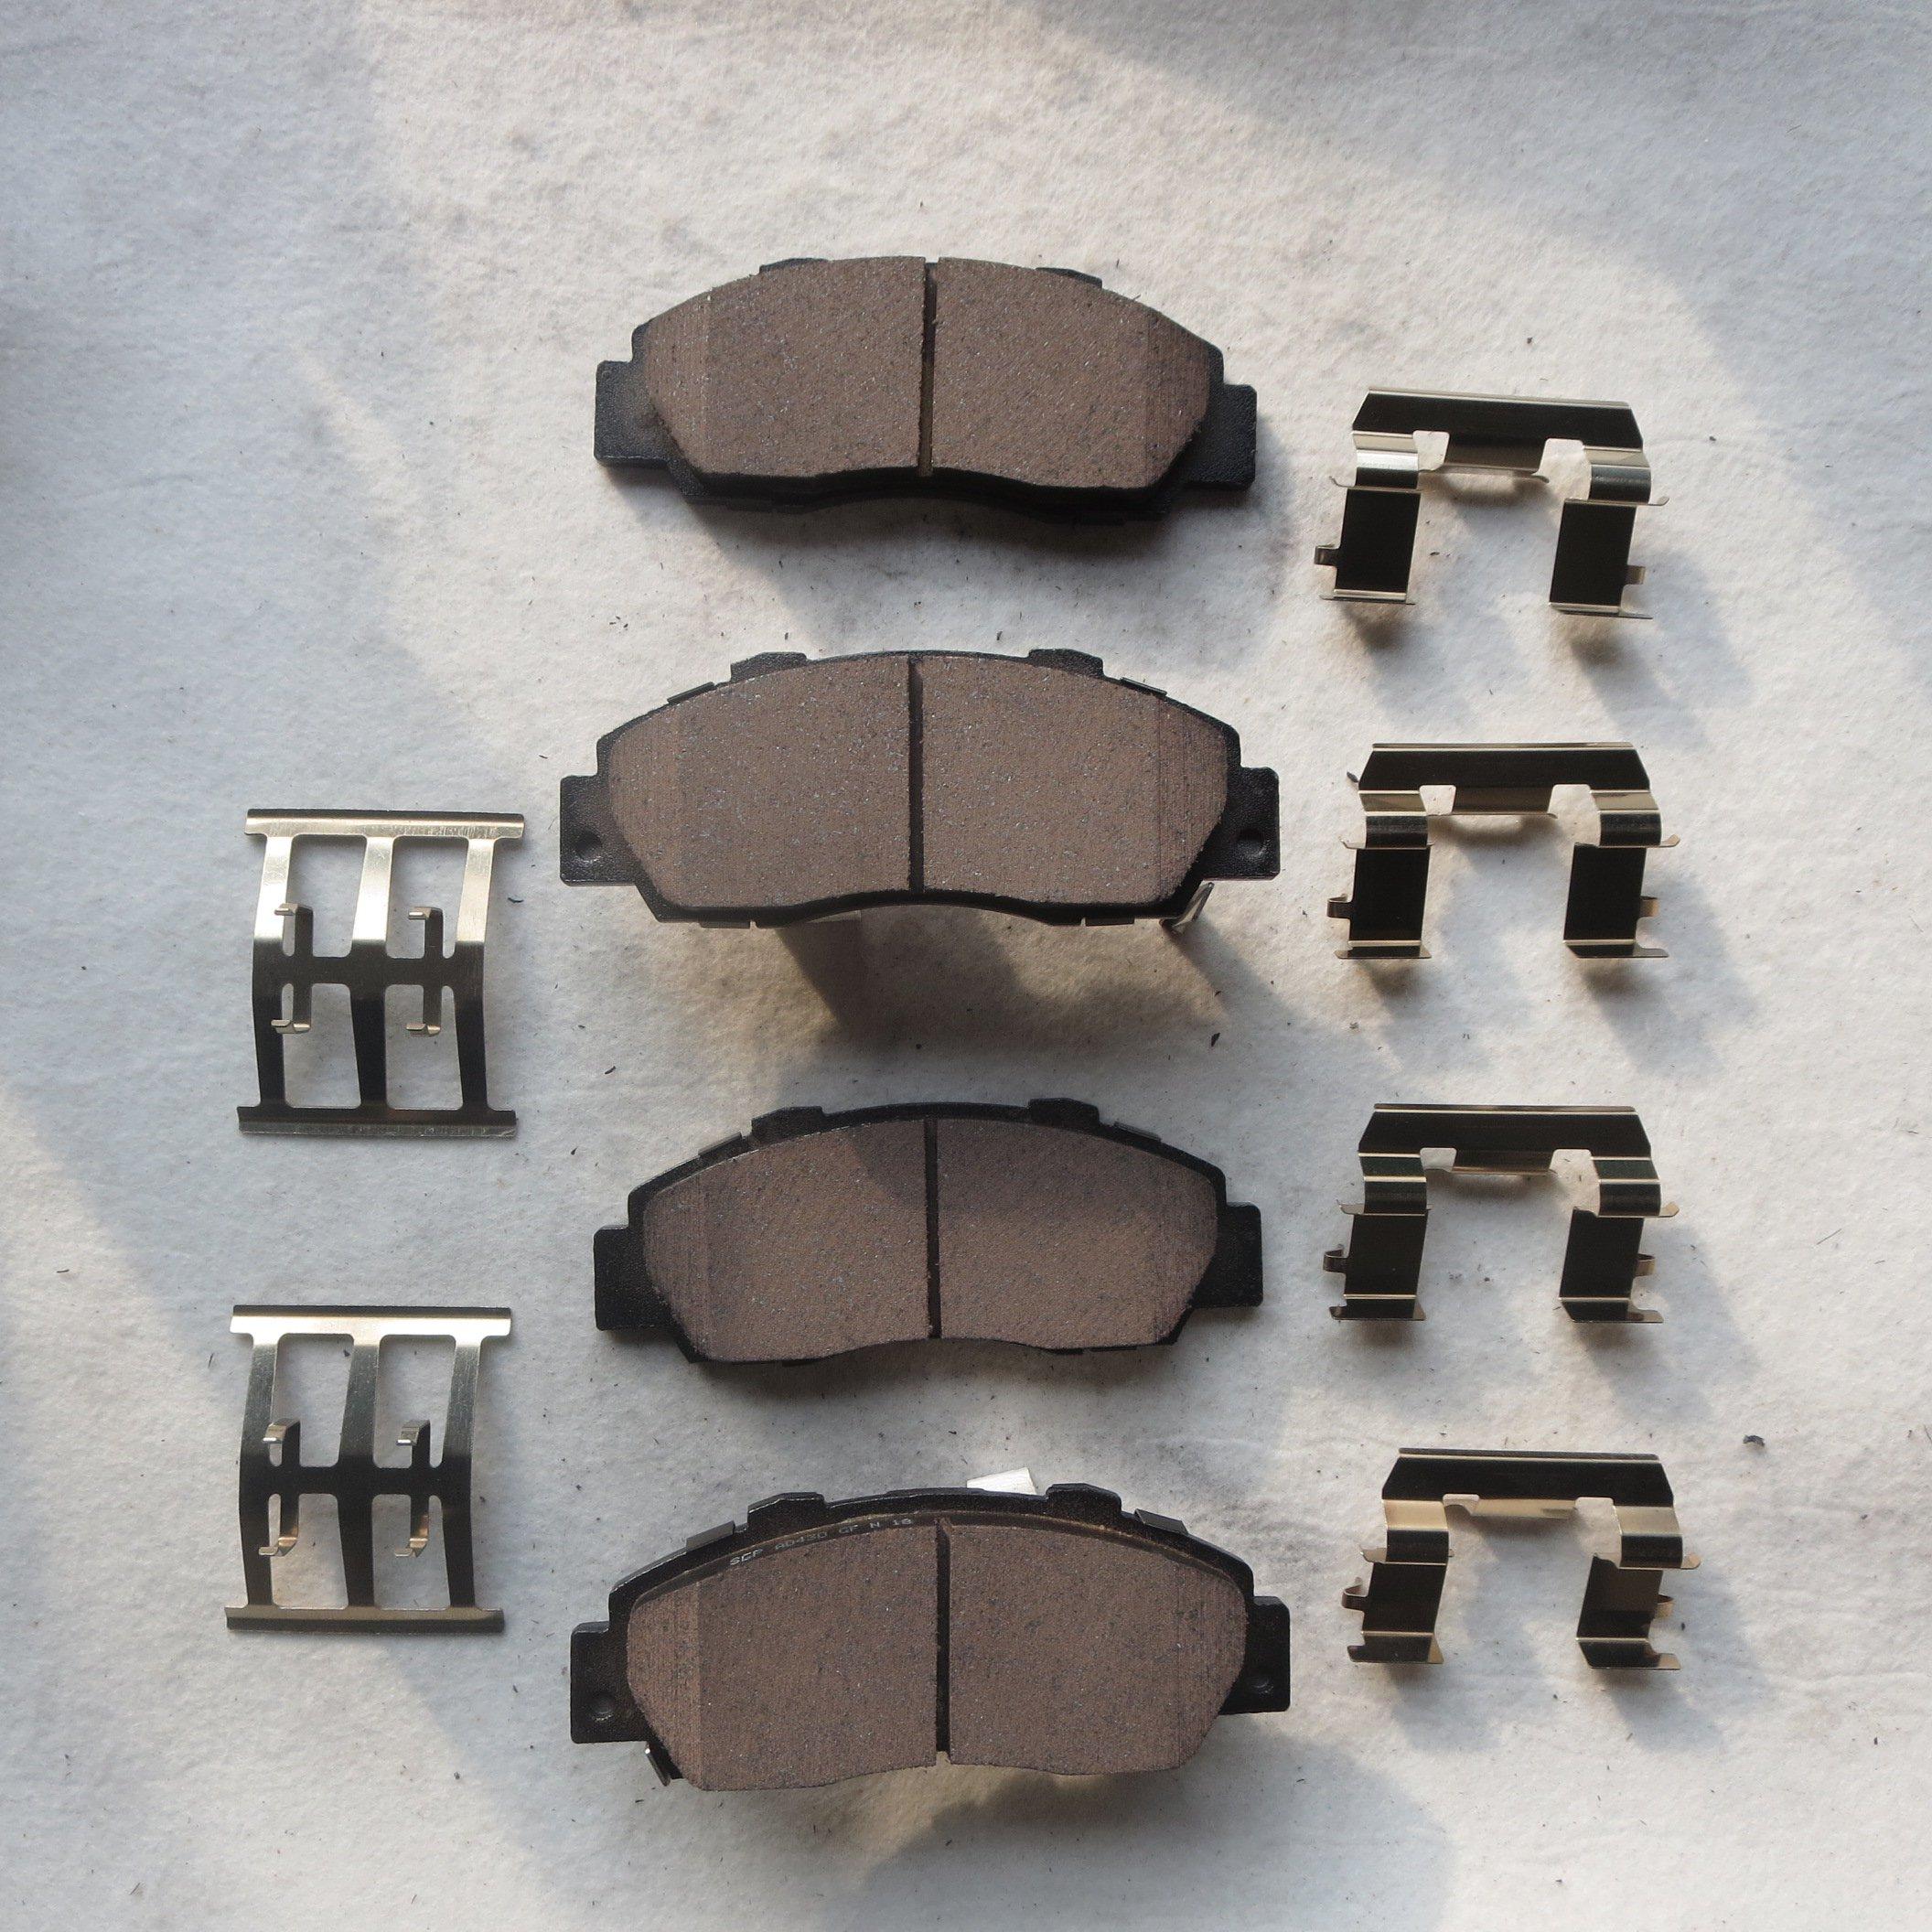 PROSTOP Front and Rear Ceramic Brake Pads Kit For 2013-2016 Hyundai Elantra